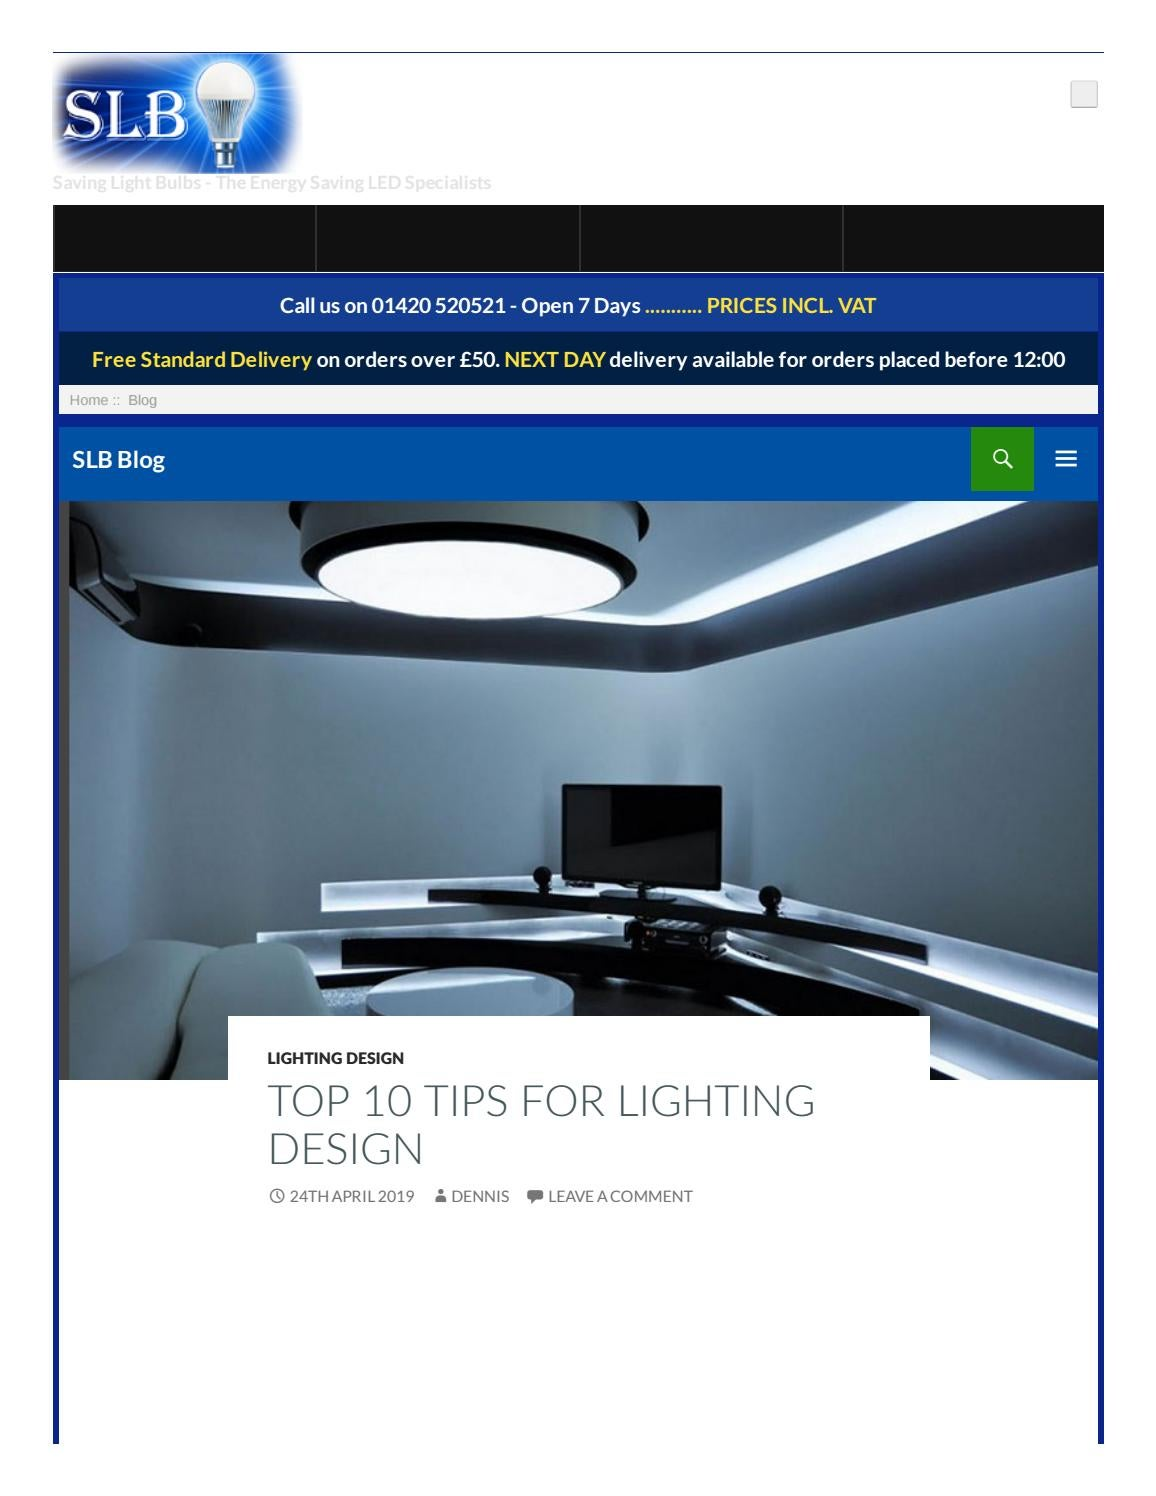 Lighting Design By Saving Light Bulbs